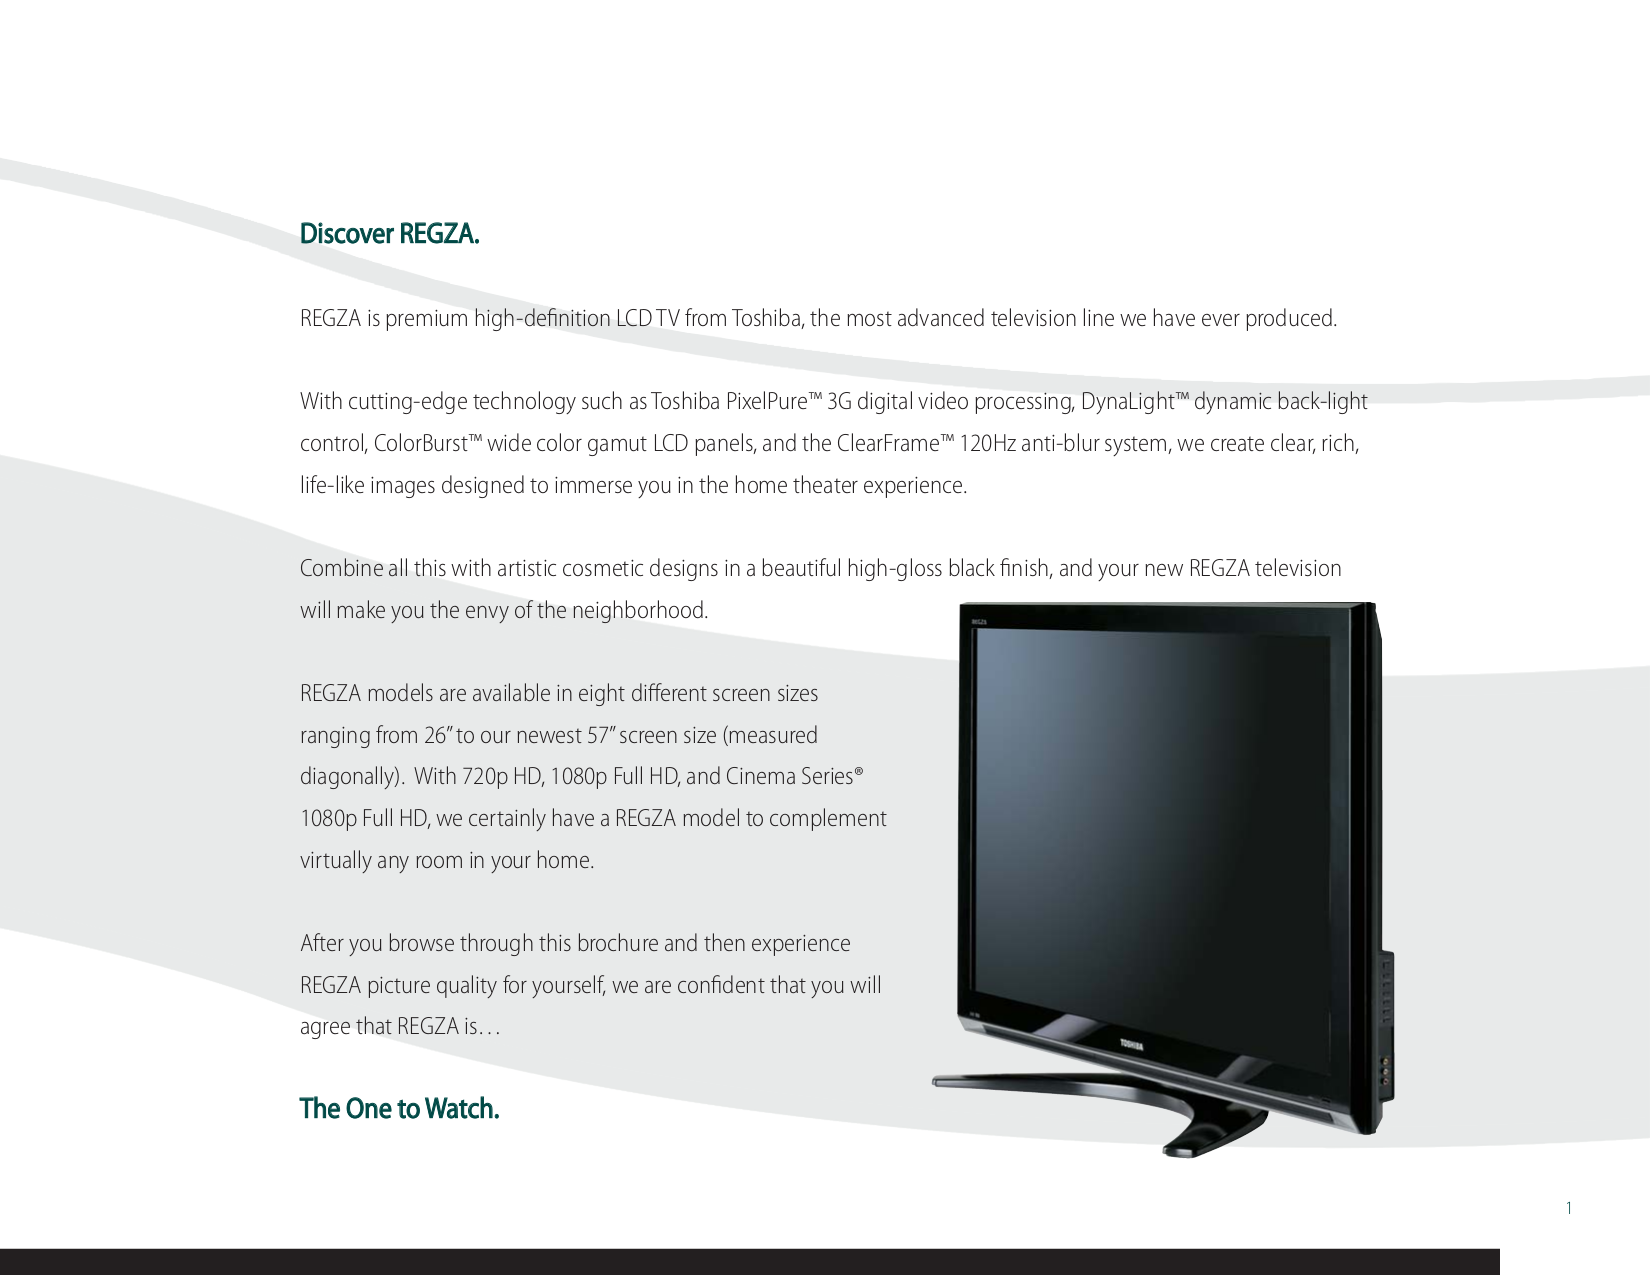 pdf manual for toshiba tv regza 42lx177 rh umlib com Toshiba Regza 32 Manual Toshiba TV Manual Online